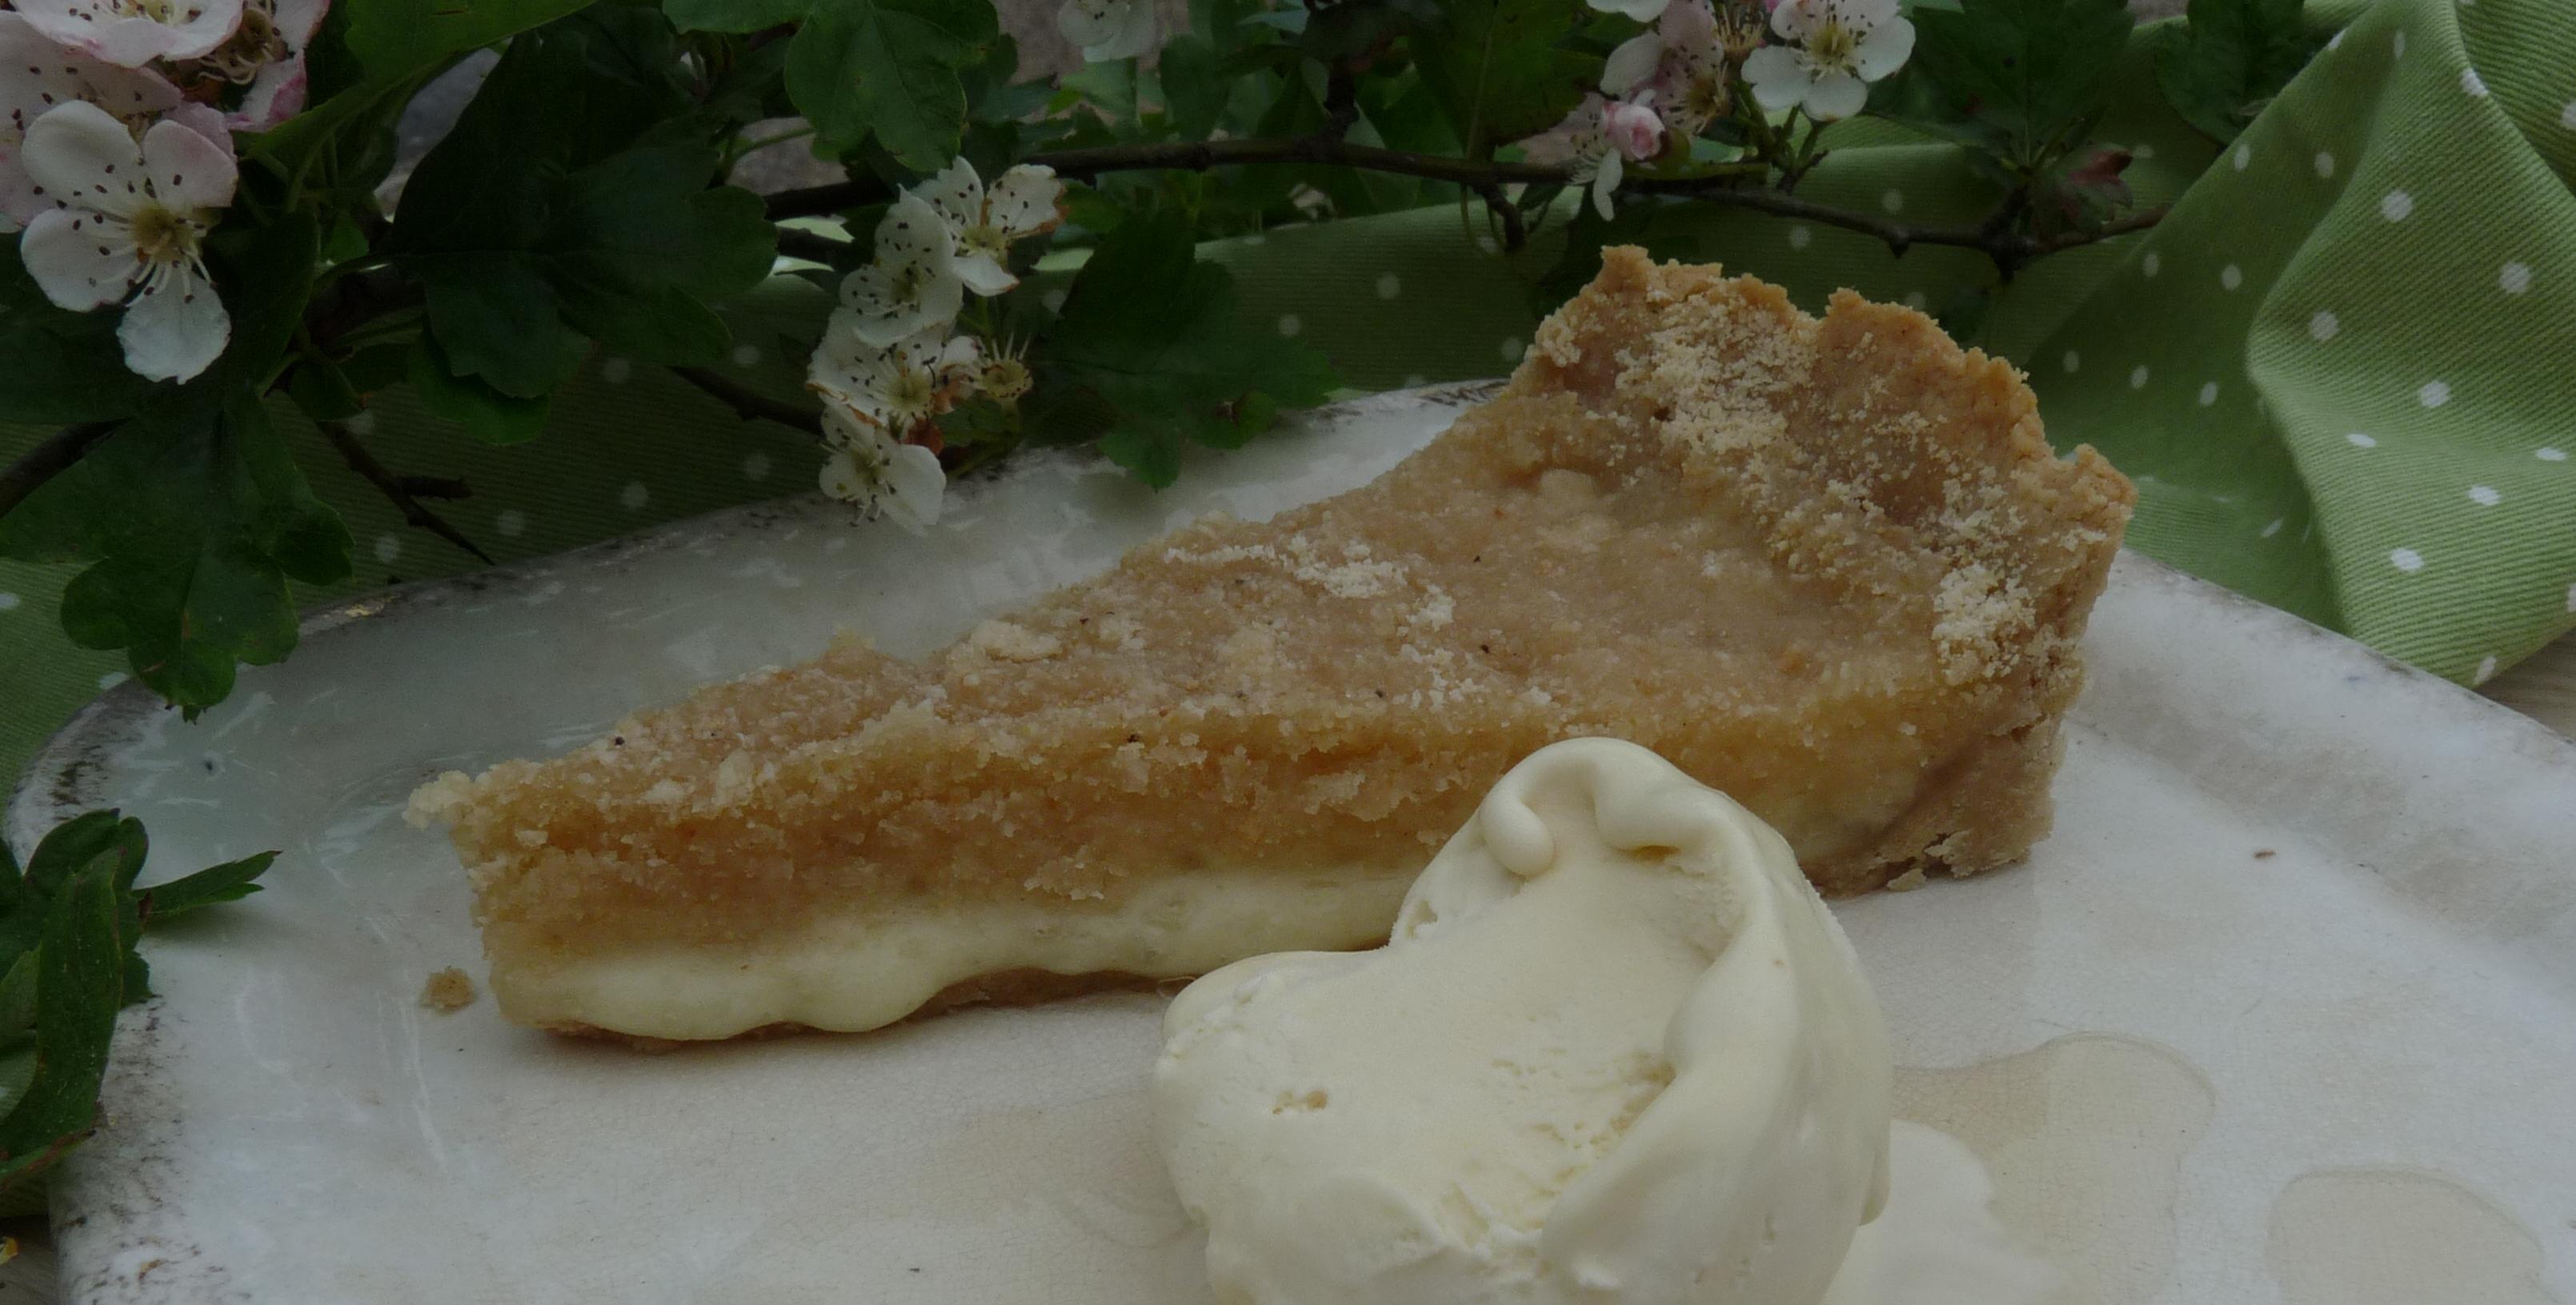 knefe tart with hawthorn blossom ice cream